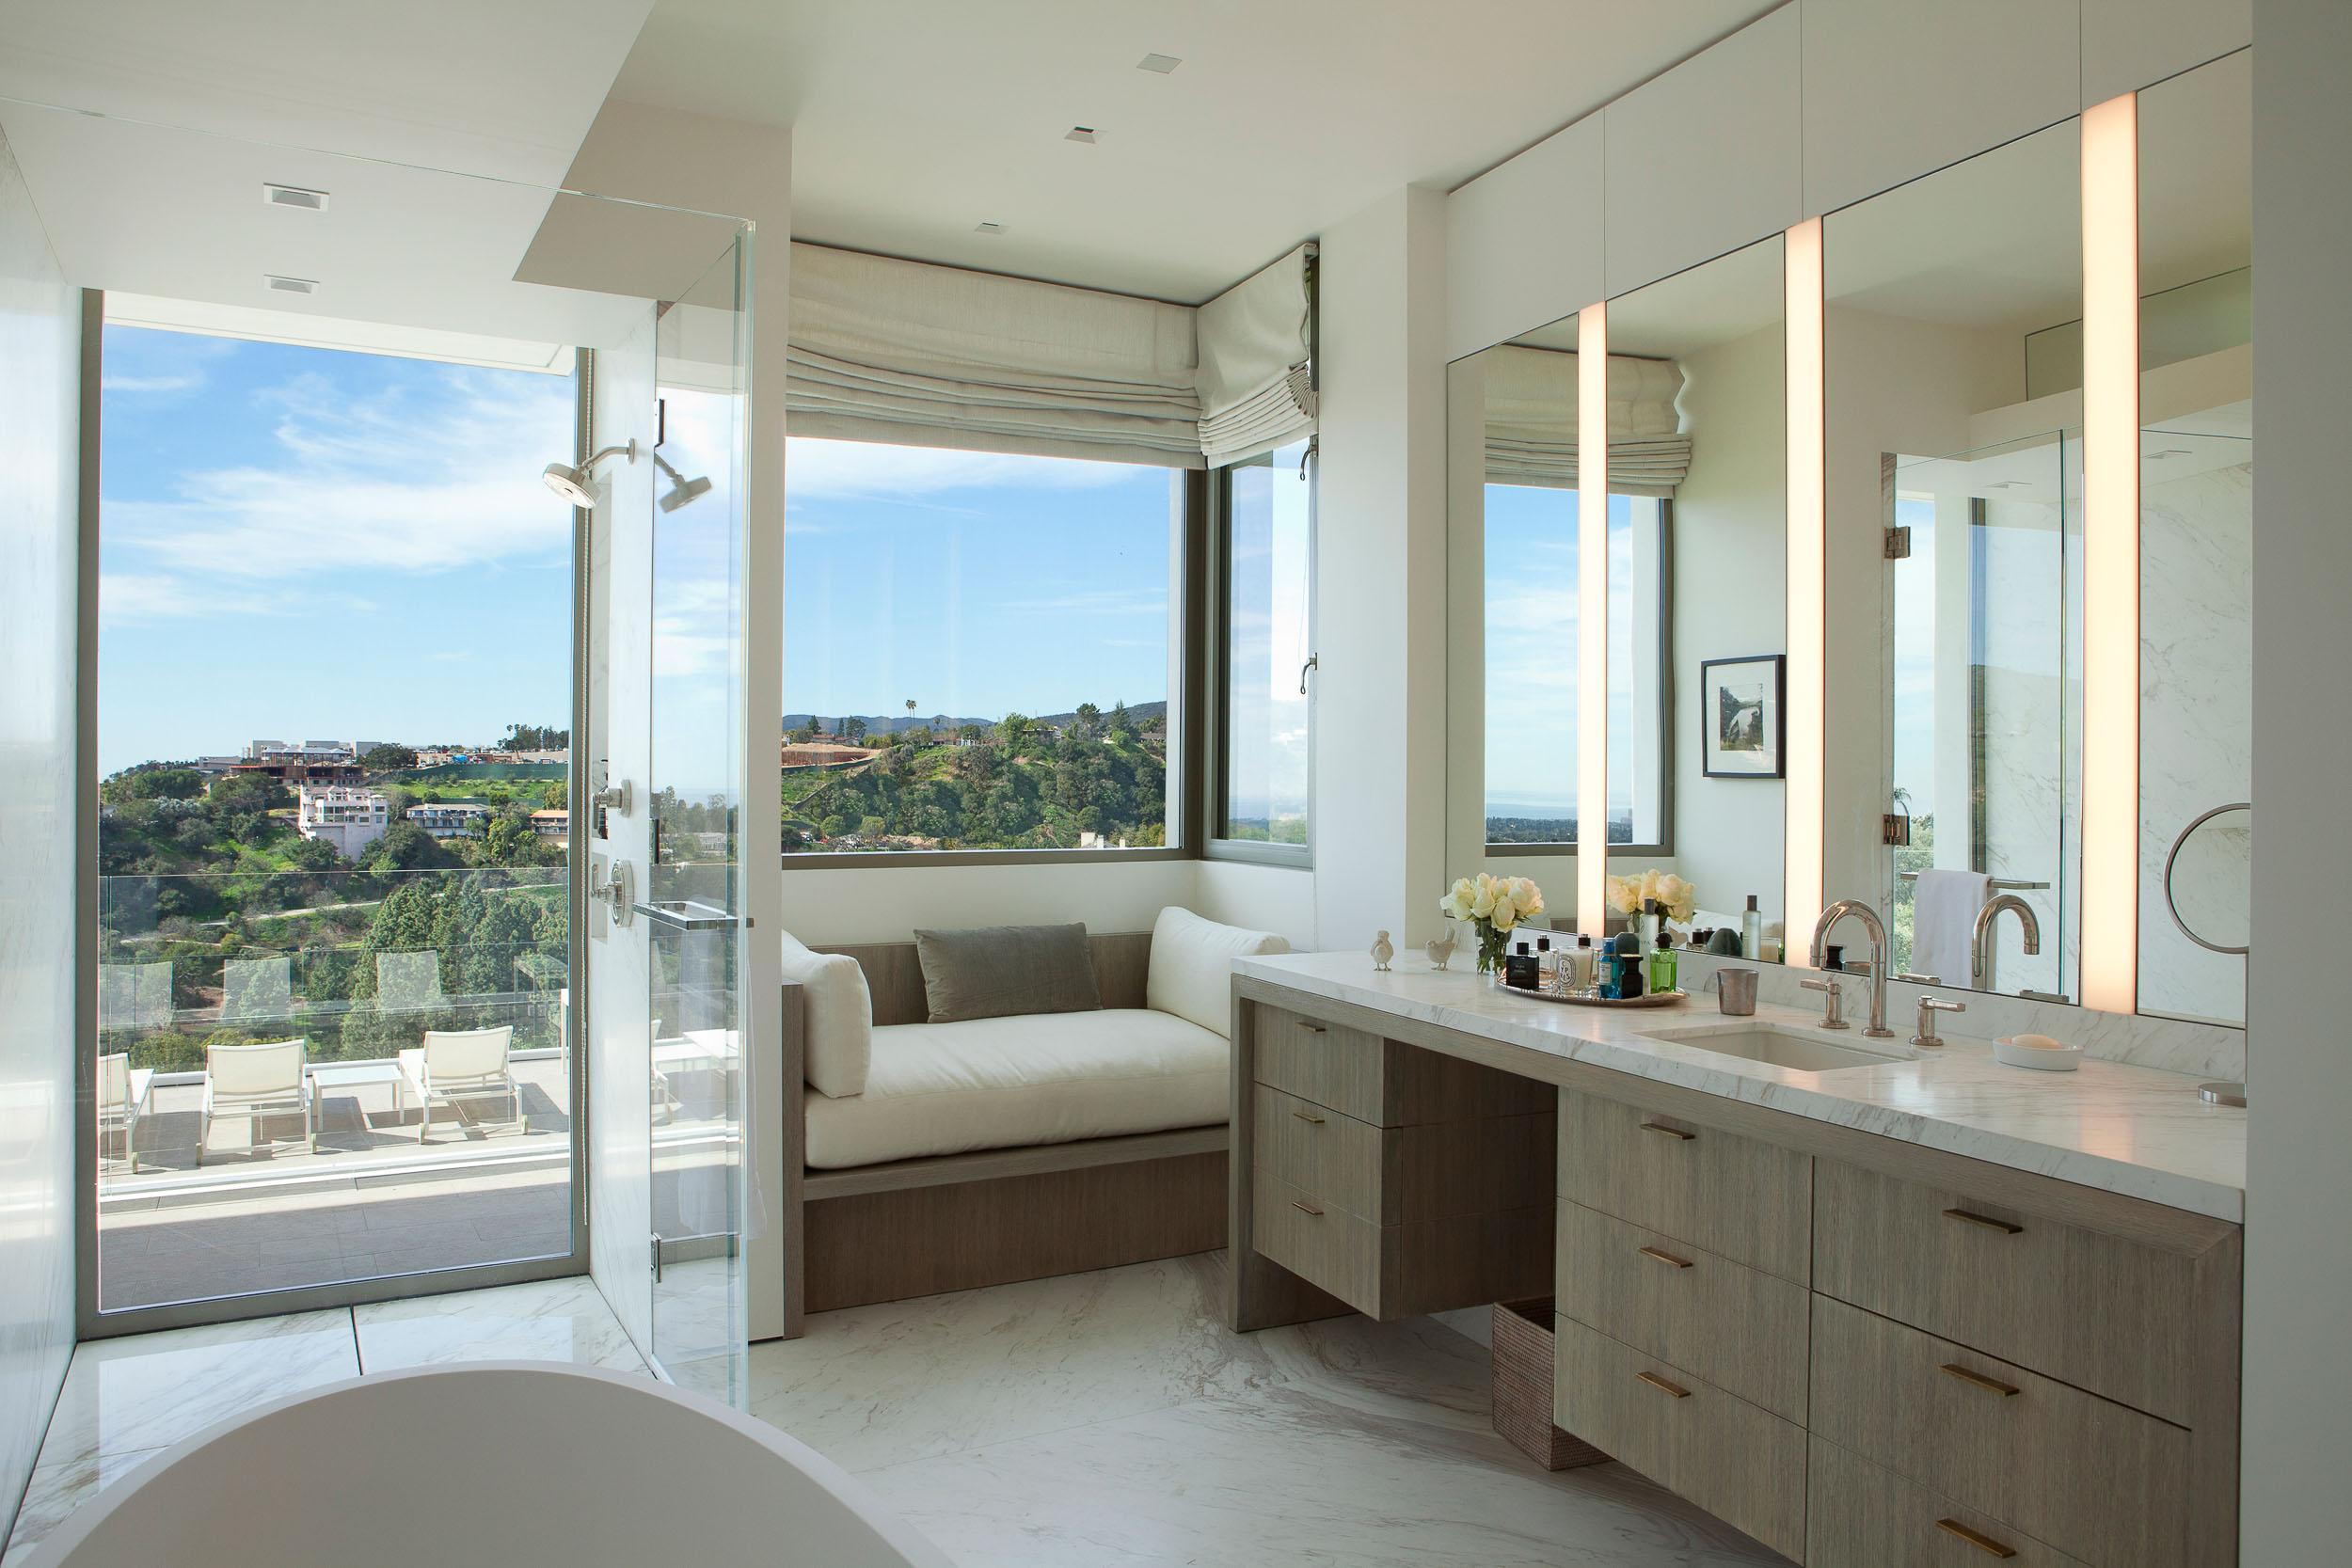 master bathroom overlooking lounge chairs